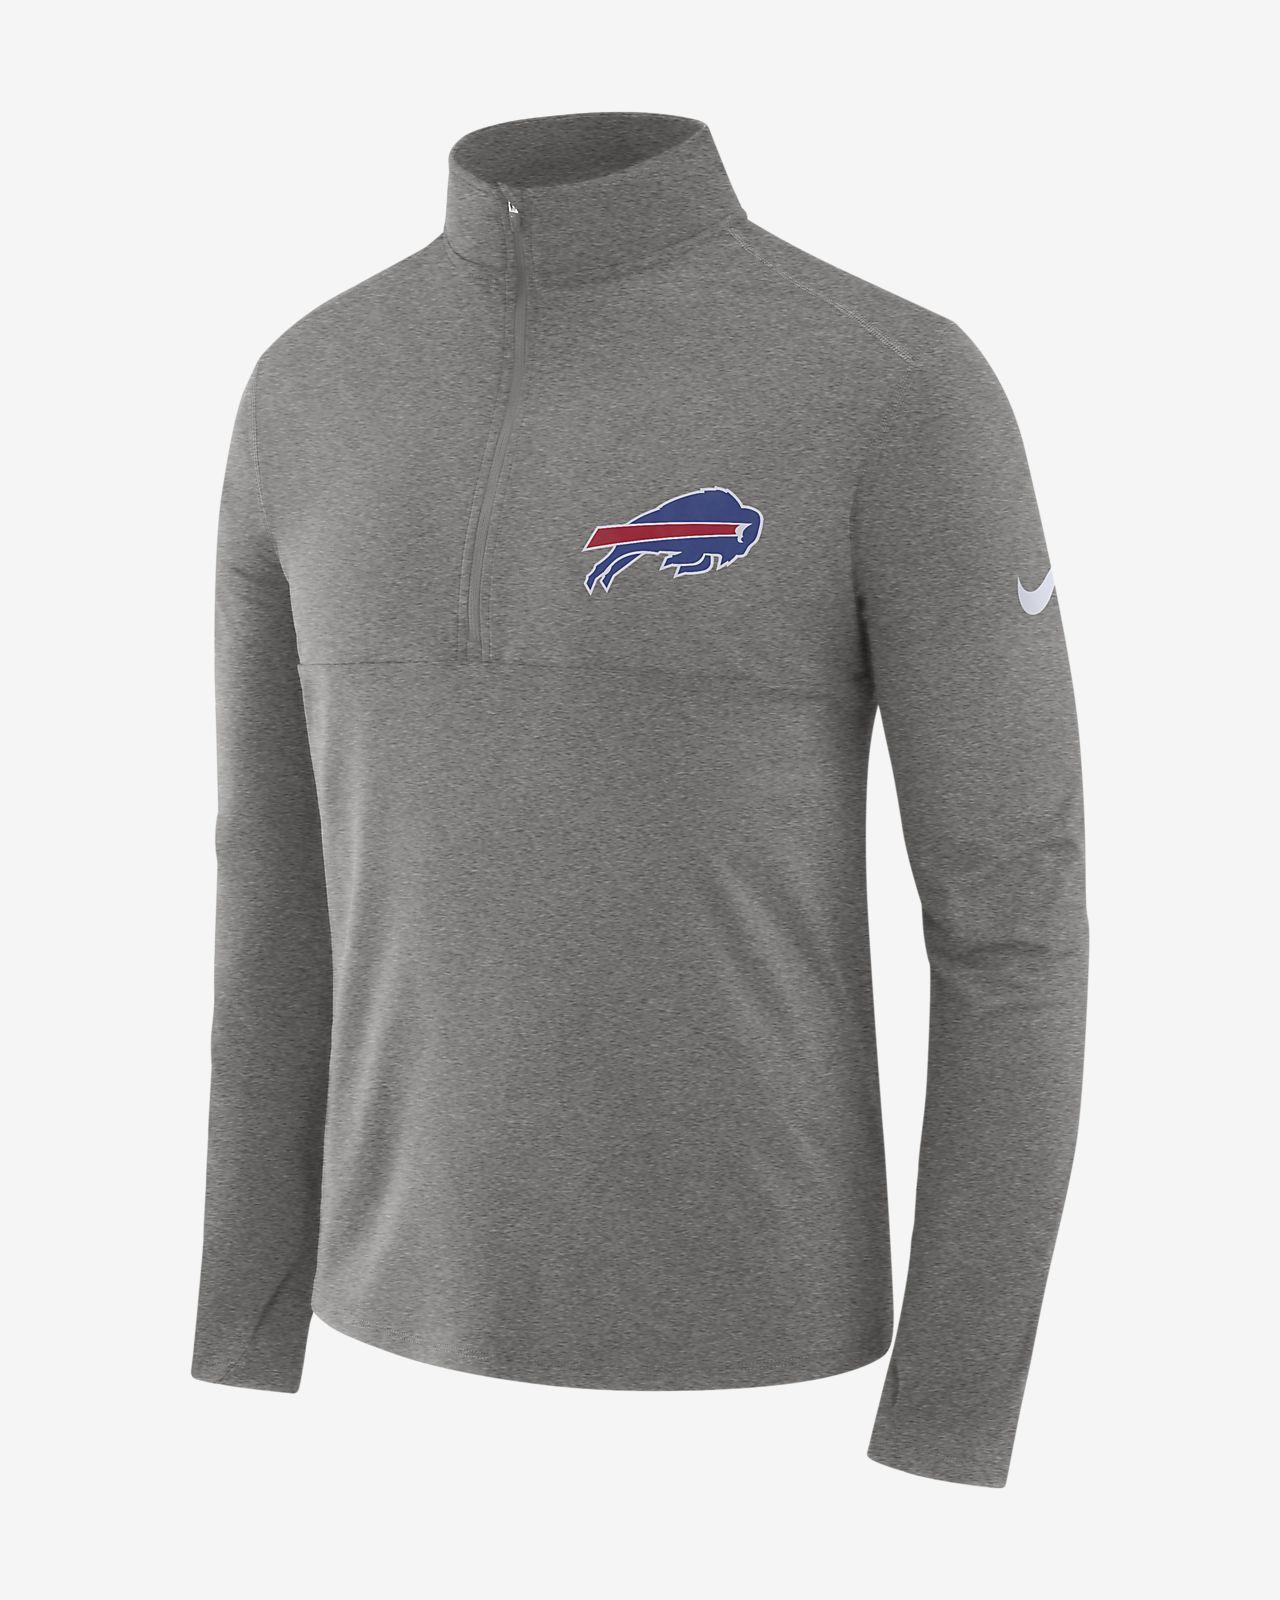 a16caa331 Nike Dri-FIT (NFL Bills) Men's Long-Sleeve 1/2-Zip Top. Nike.com